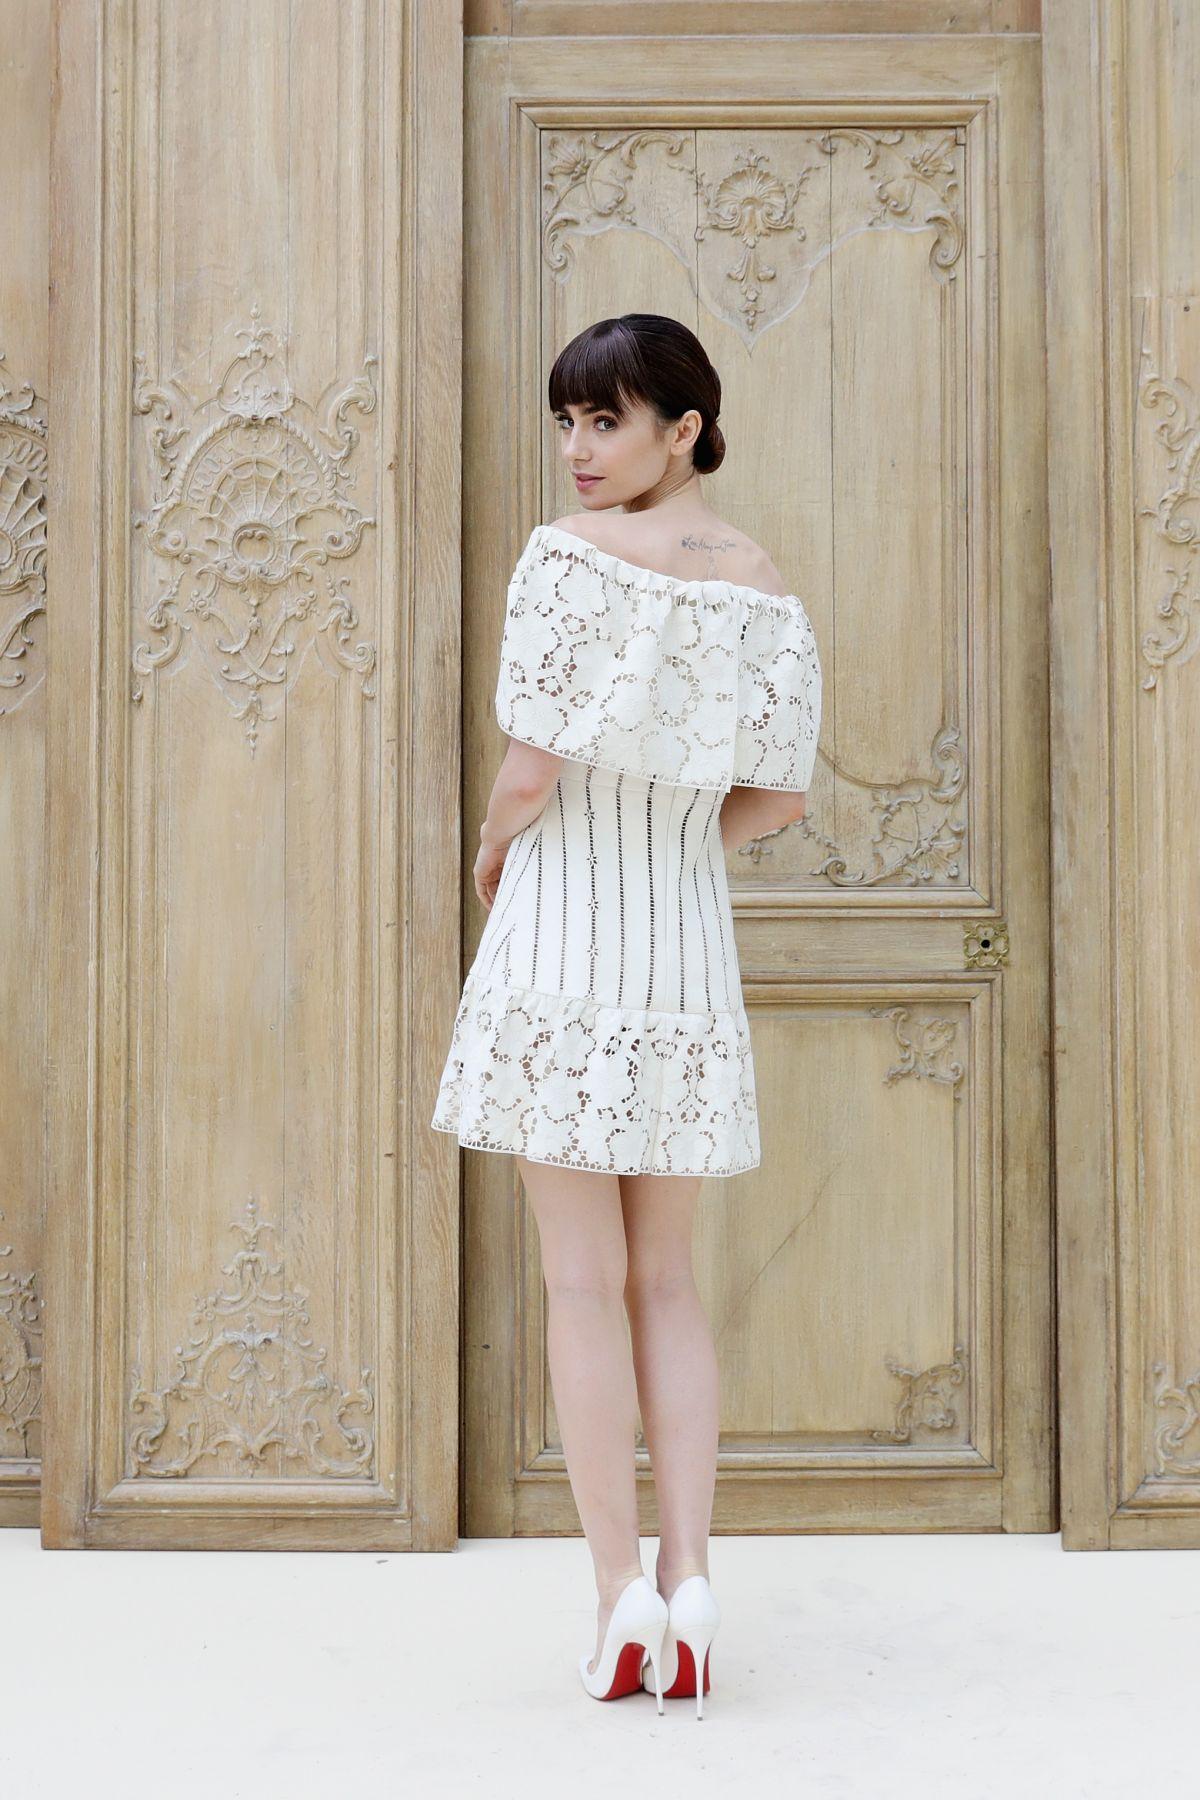 Lily Collins At Valentino Fashion Show At Paris Fashion